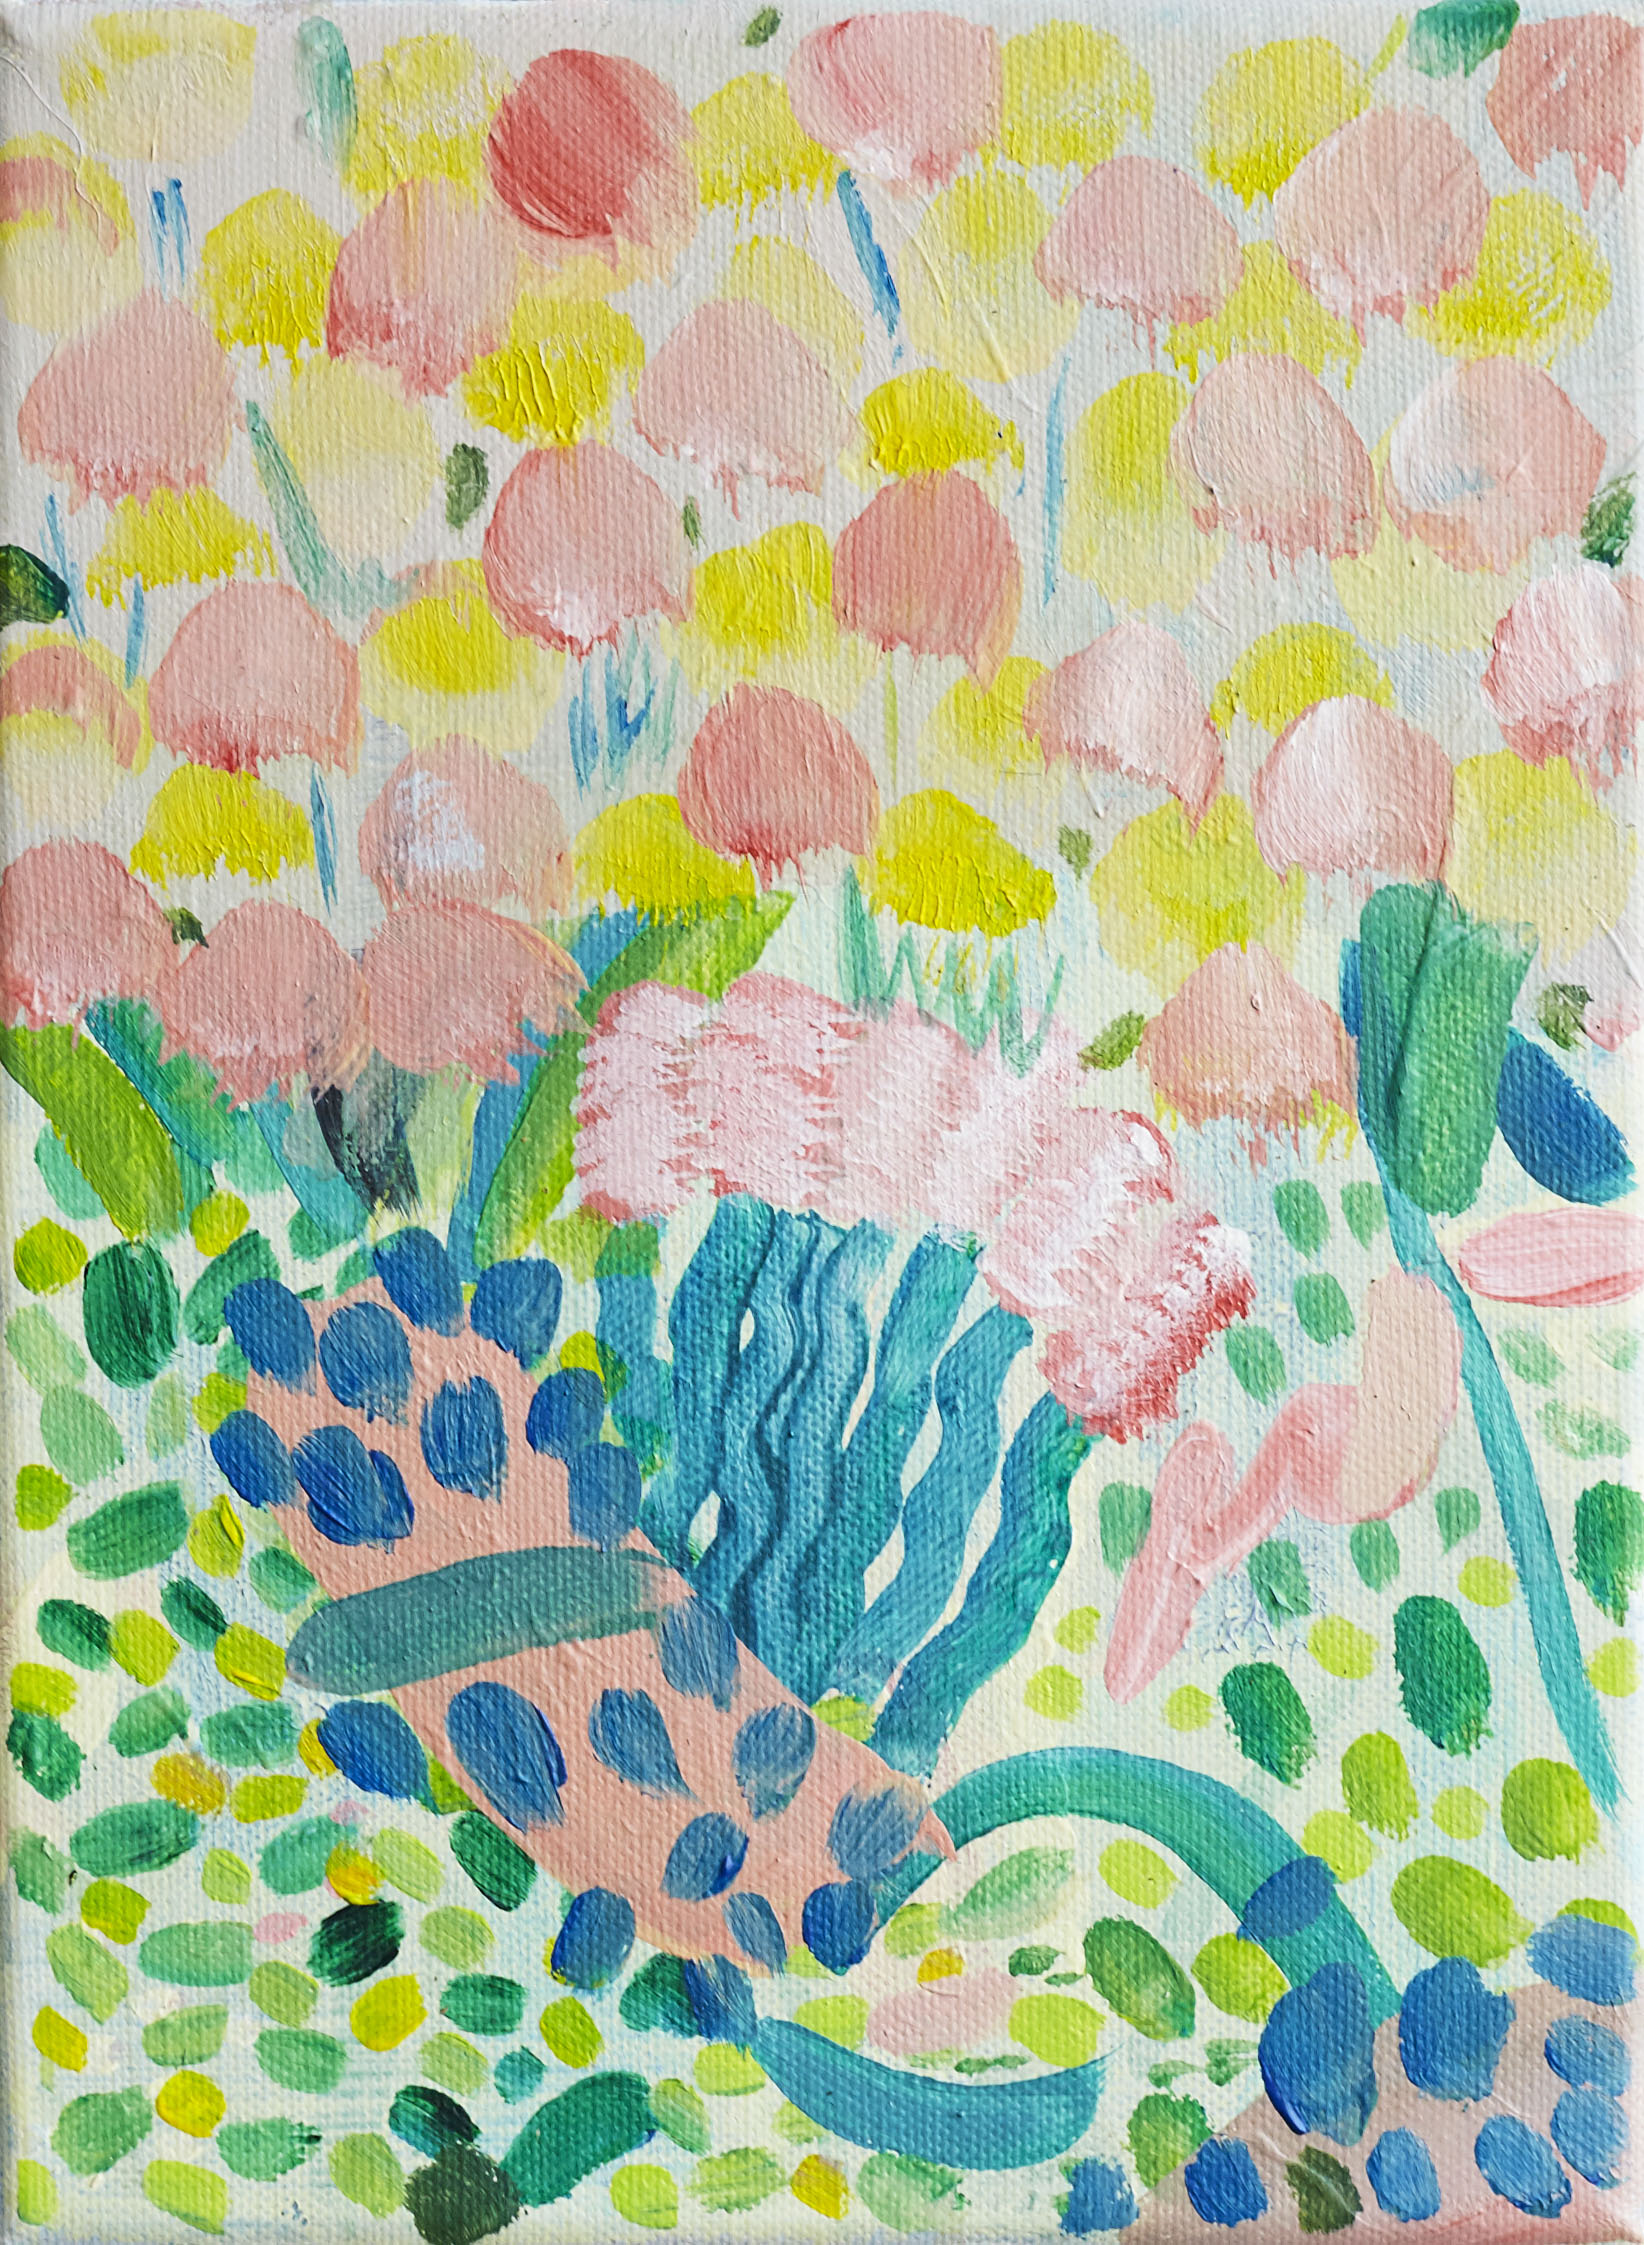 'Love Grows'  13cm x18cm acrylic on canvas (sold)